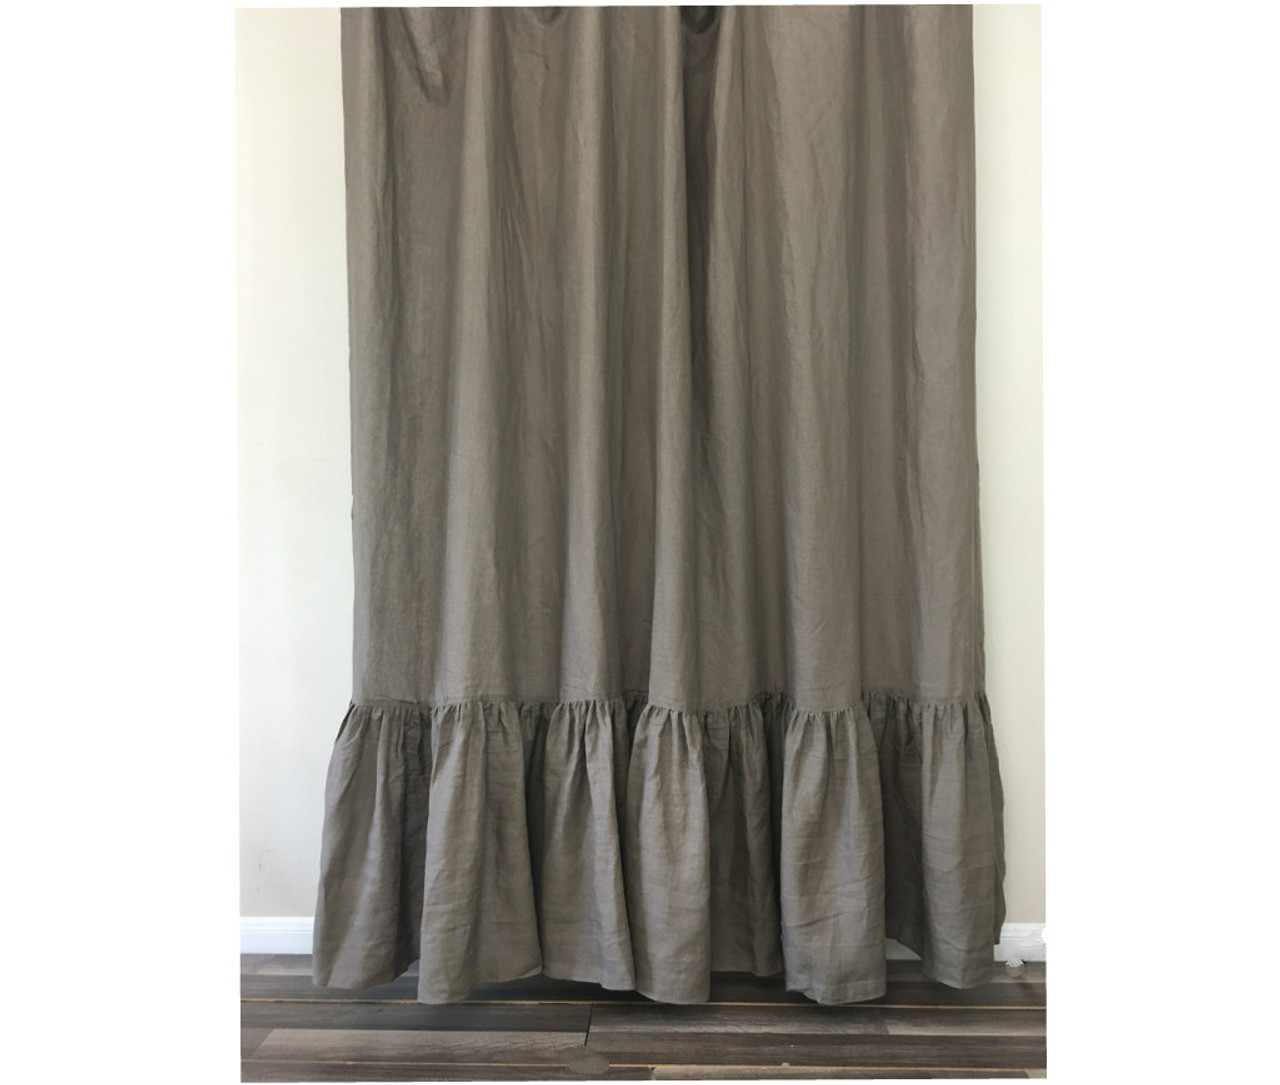 Cedar Dark Brown Linen Shower Curtain With Mermaid Long Ruffles